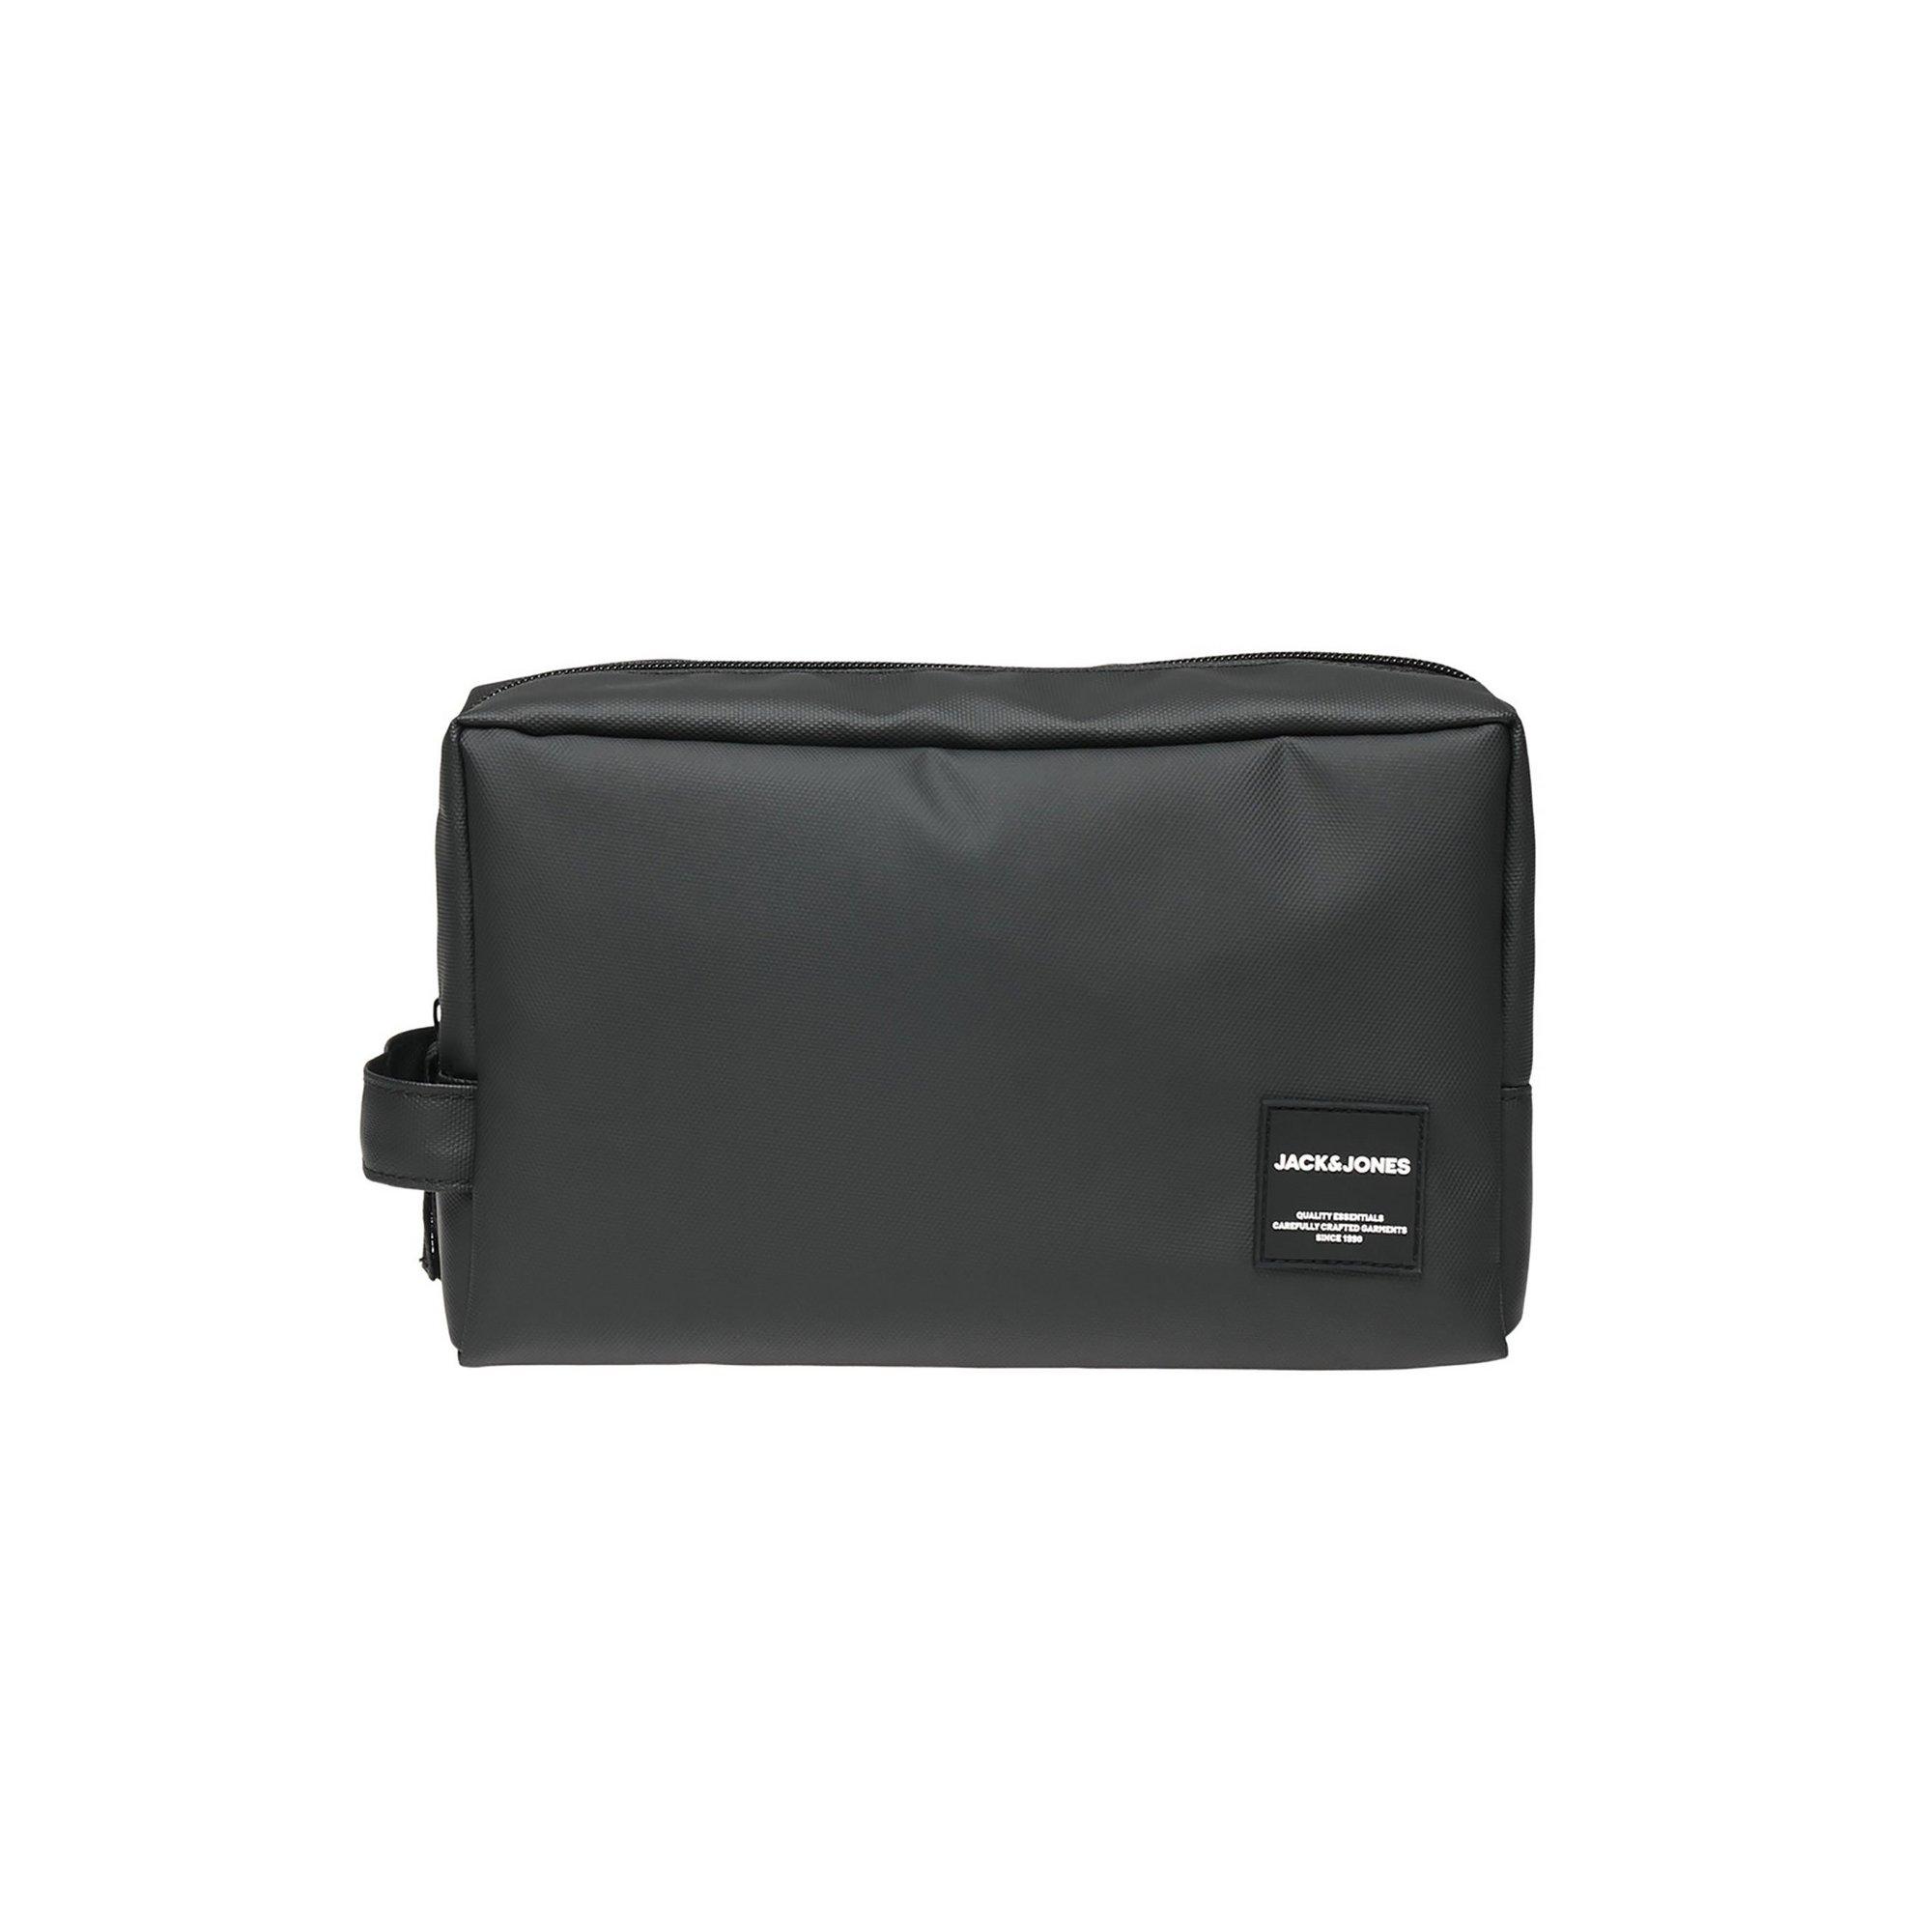 Image of Jack and Jones Toiletries Bag